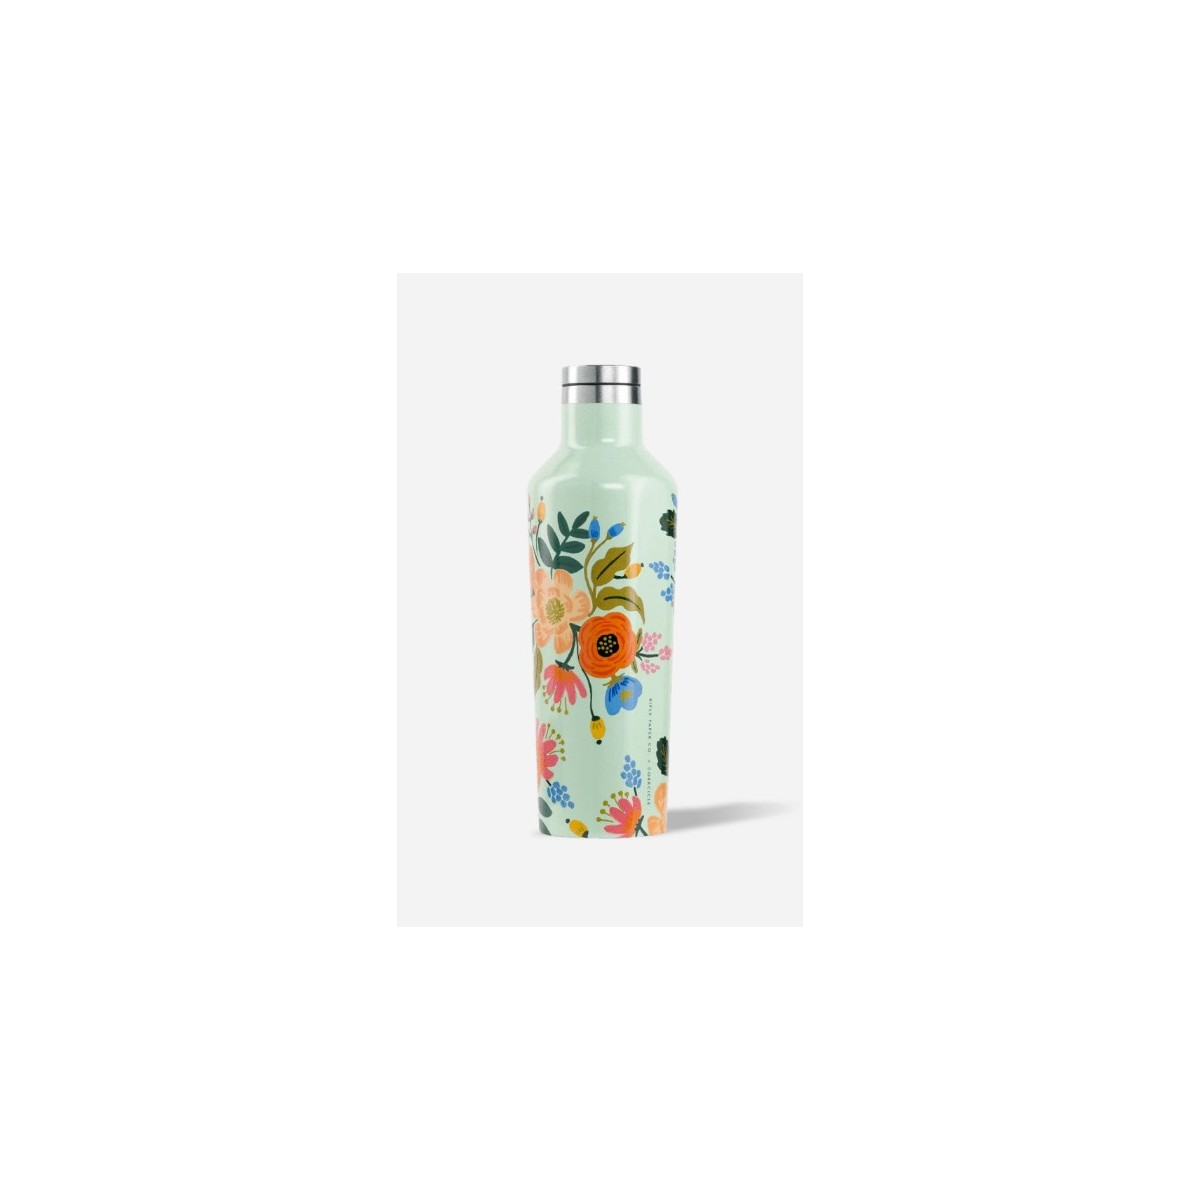 Borraccia termica - Lively floral 16oz